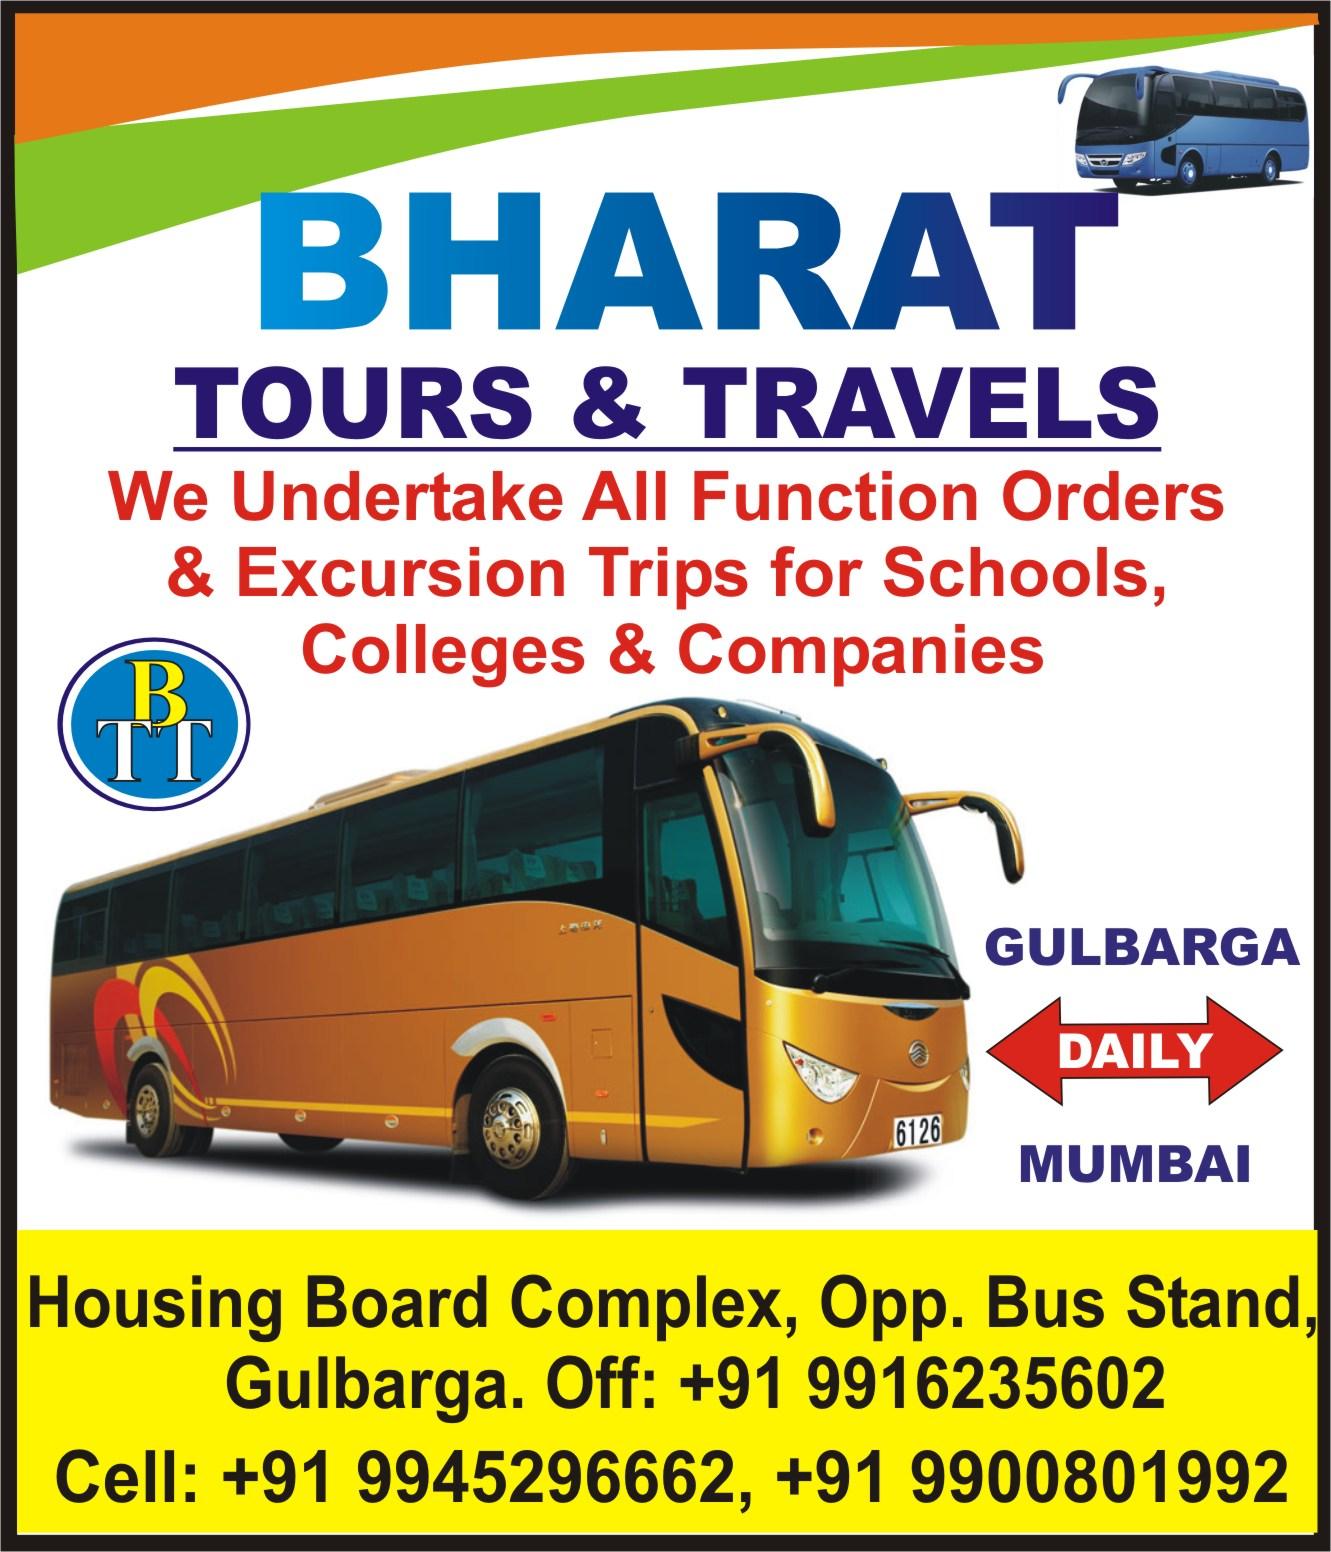 BHARAT TOURS & TRAVELS